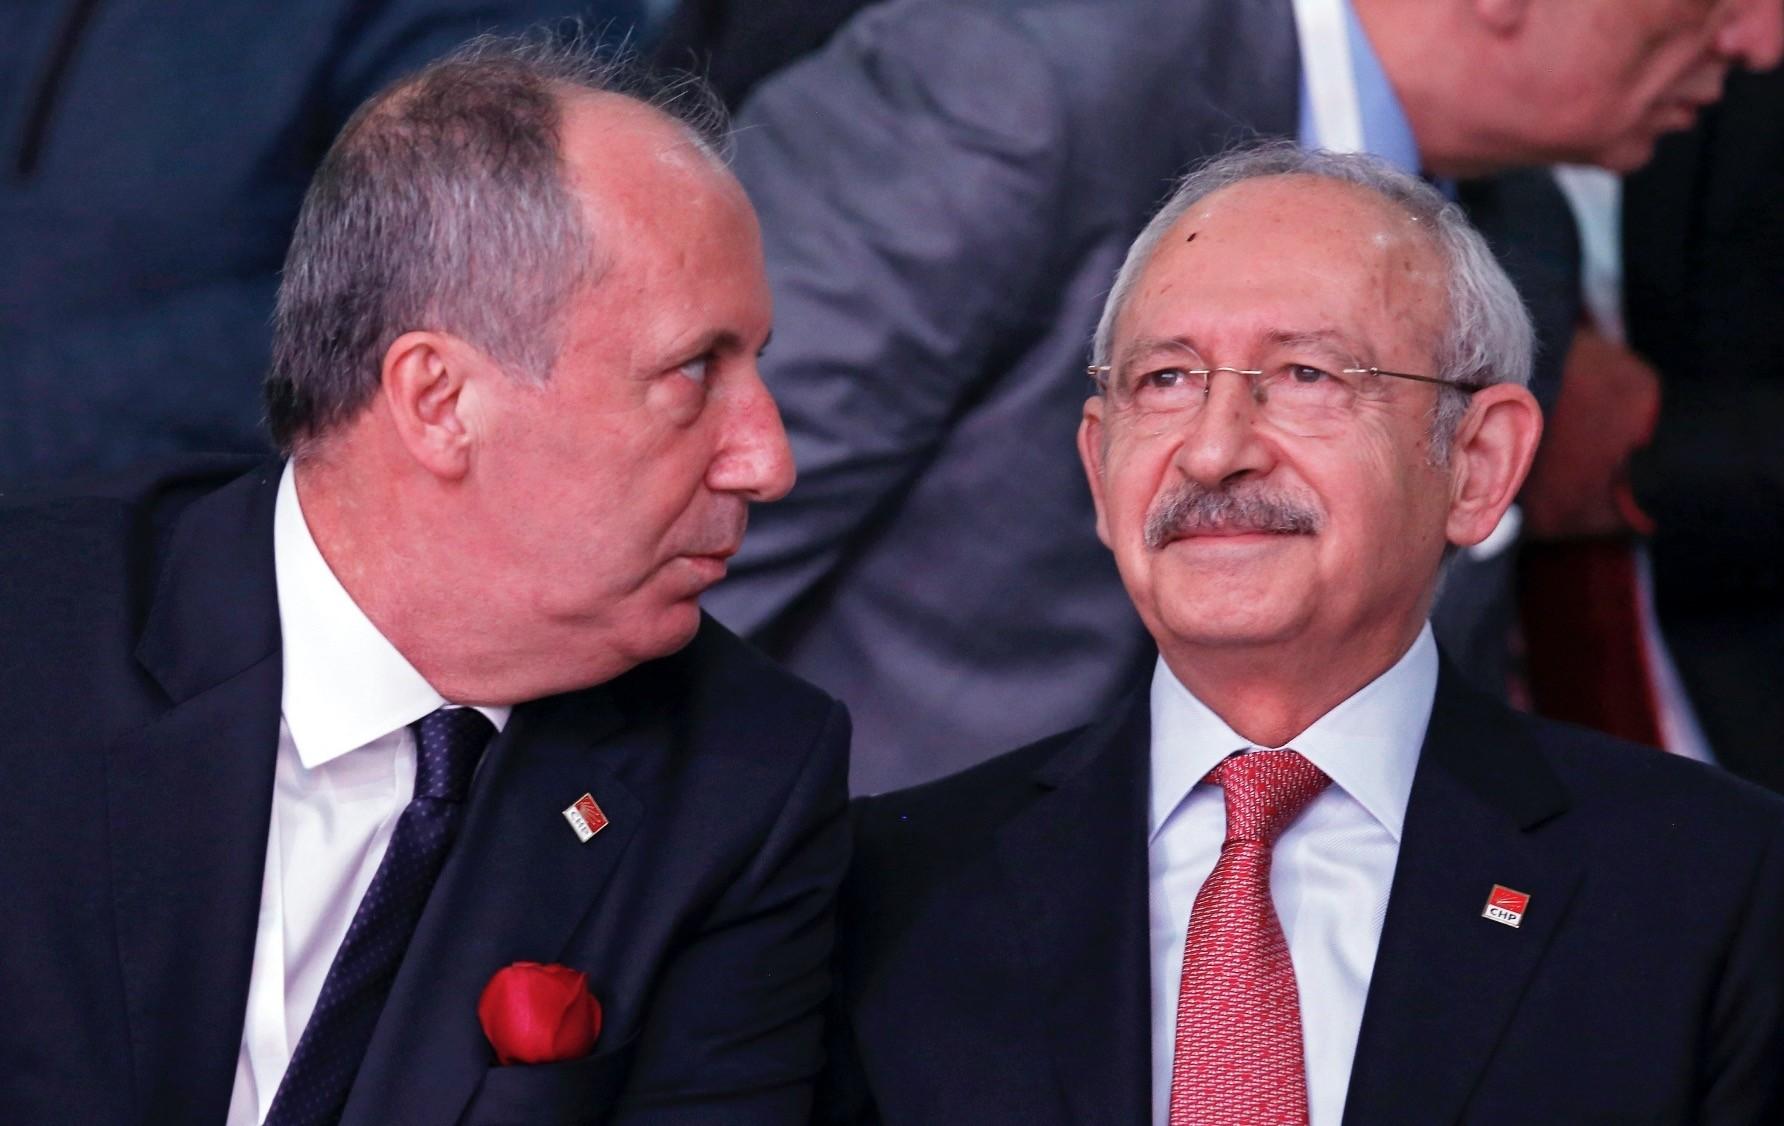 CHP Yalova deputy and CHPu2019s presidential candidate Muharrem u0130nce (L) with CHP Chairman Kemal Ku0131lu0131u00e7darou011flu during the partyu2019s 36th ordinary congress in Ankara, Feb. 3.